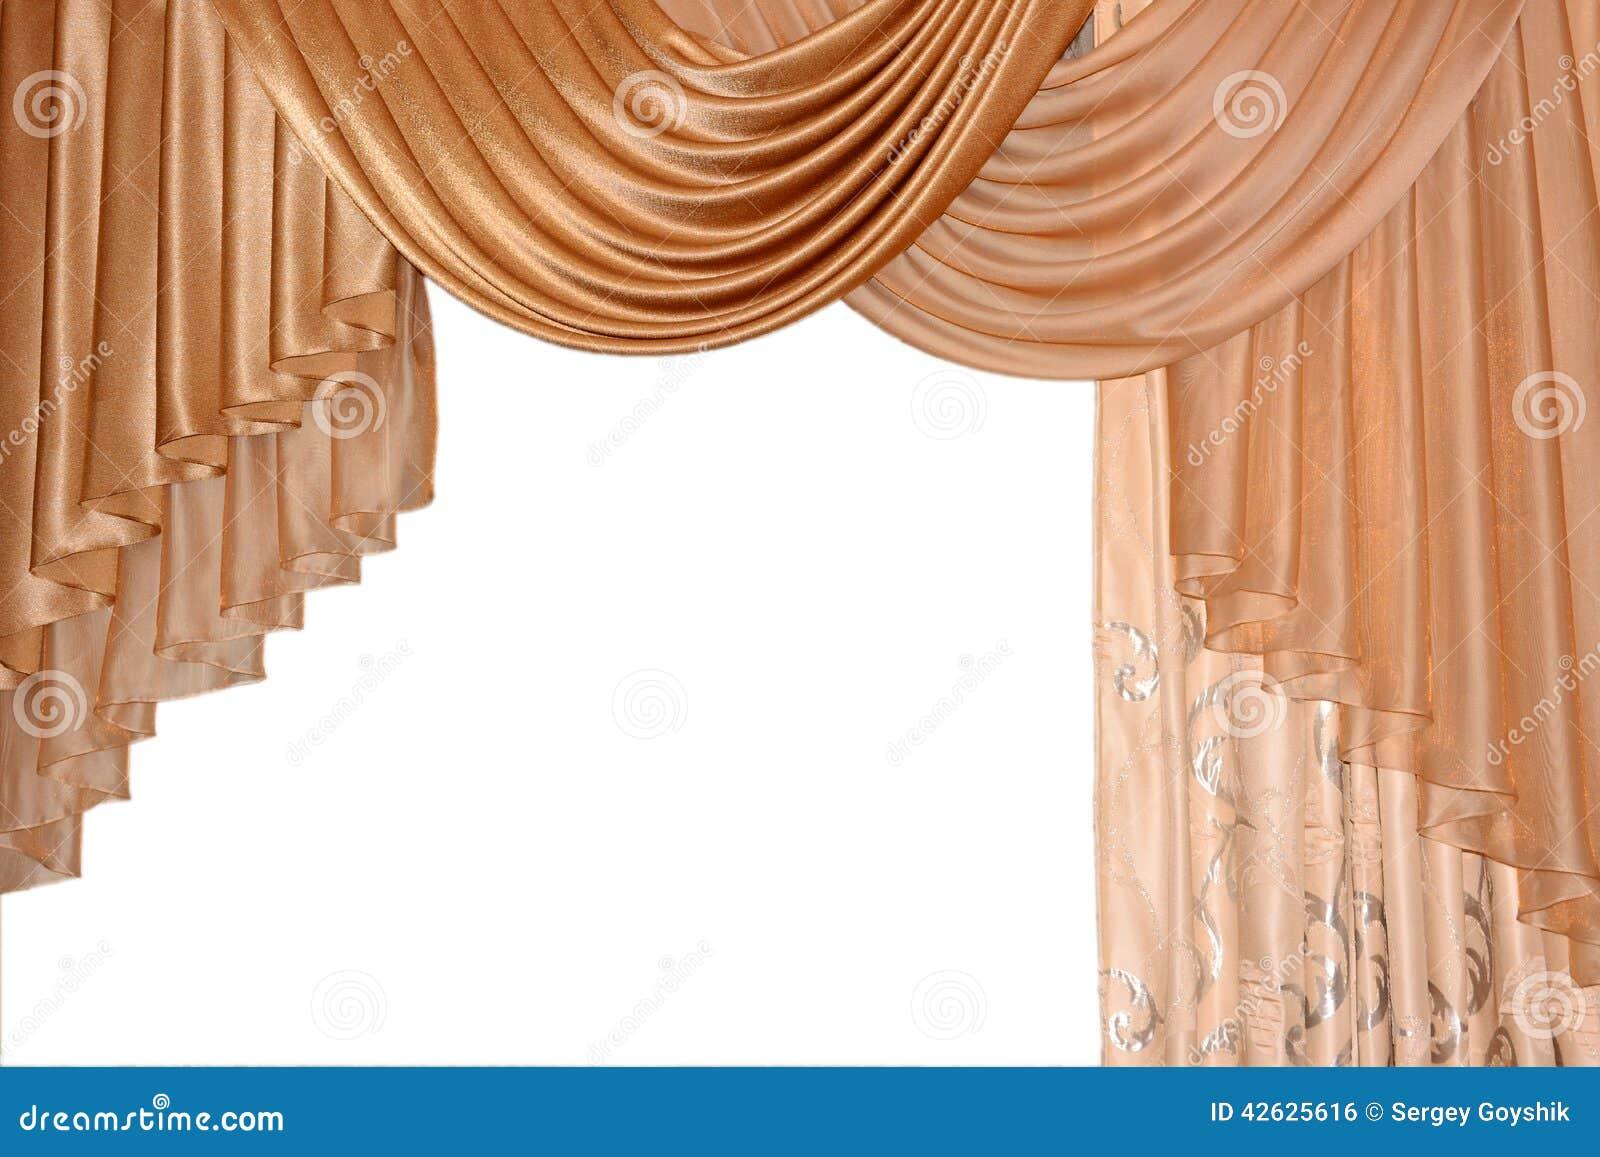 Open lambrequin portiere curtain golden color stock for Decoration fenetre post it